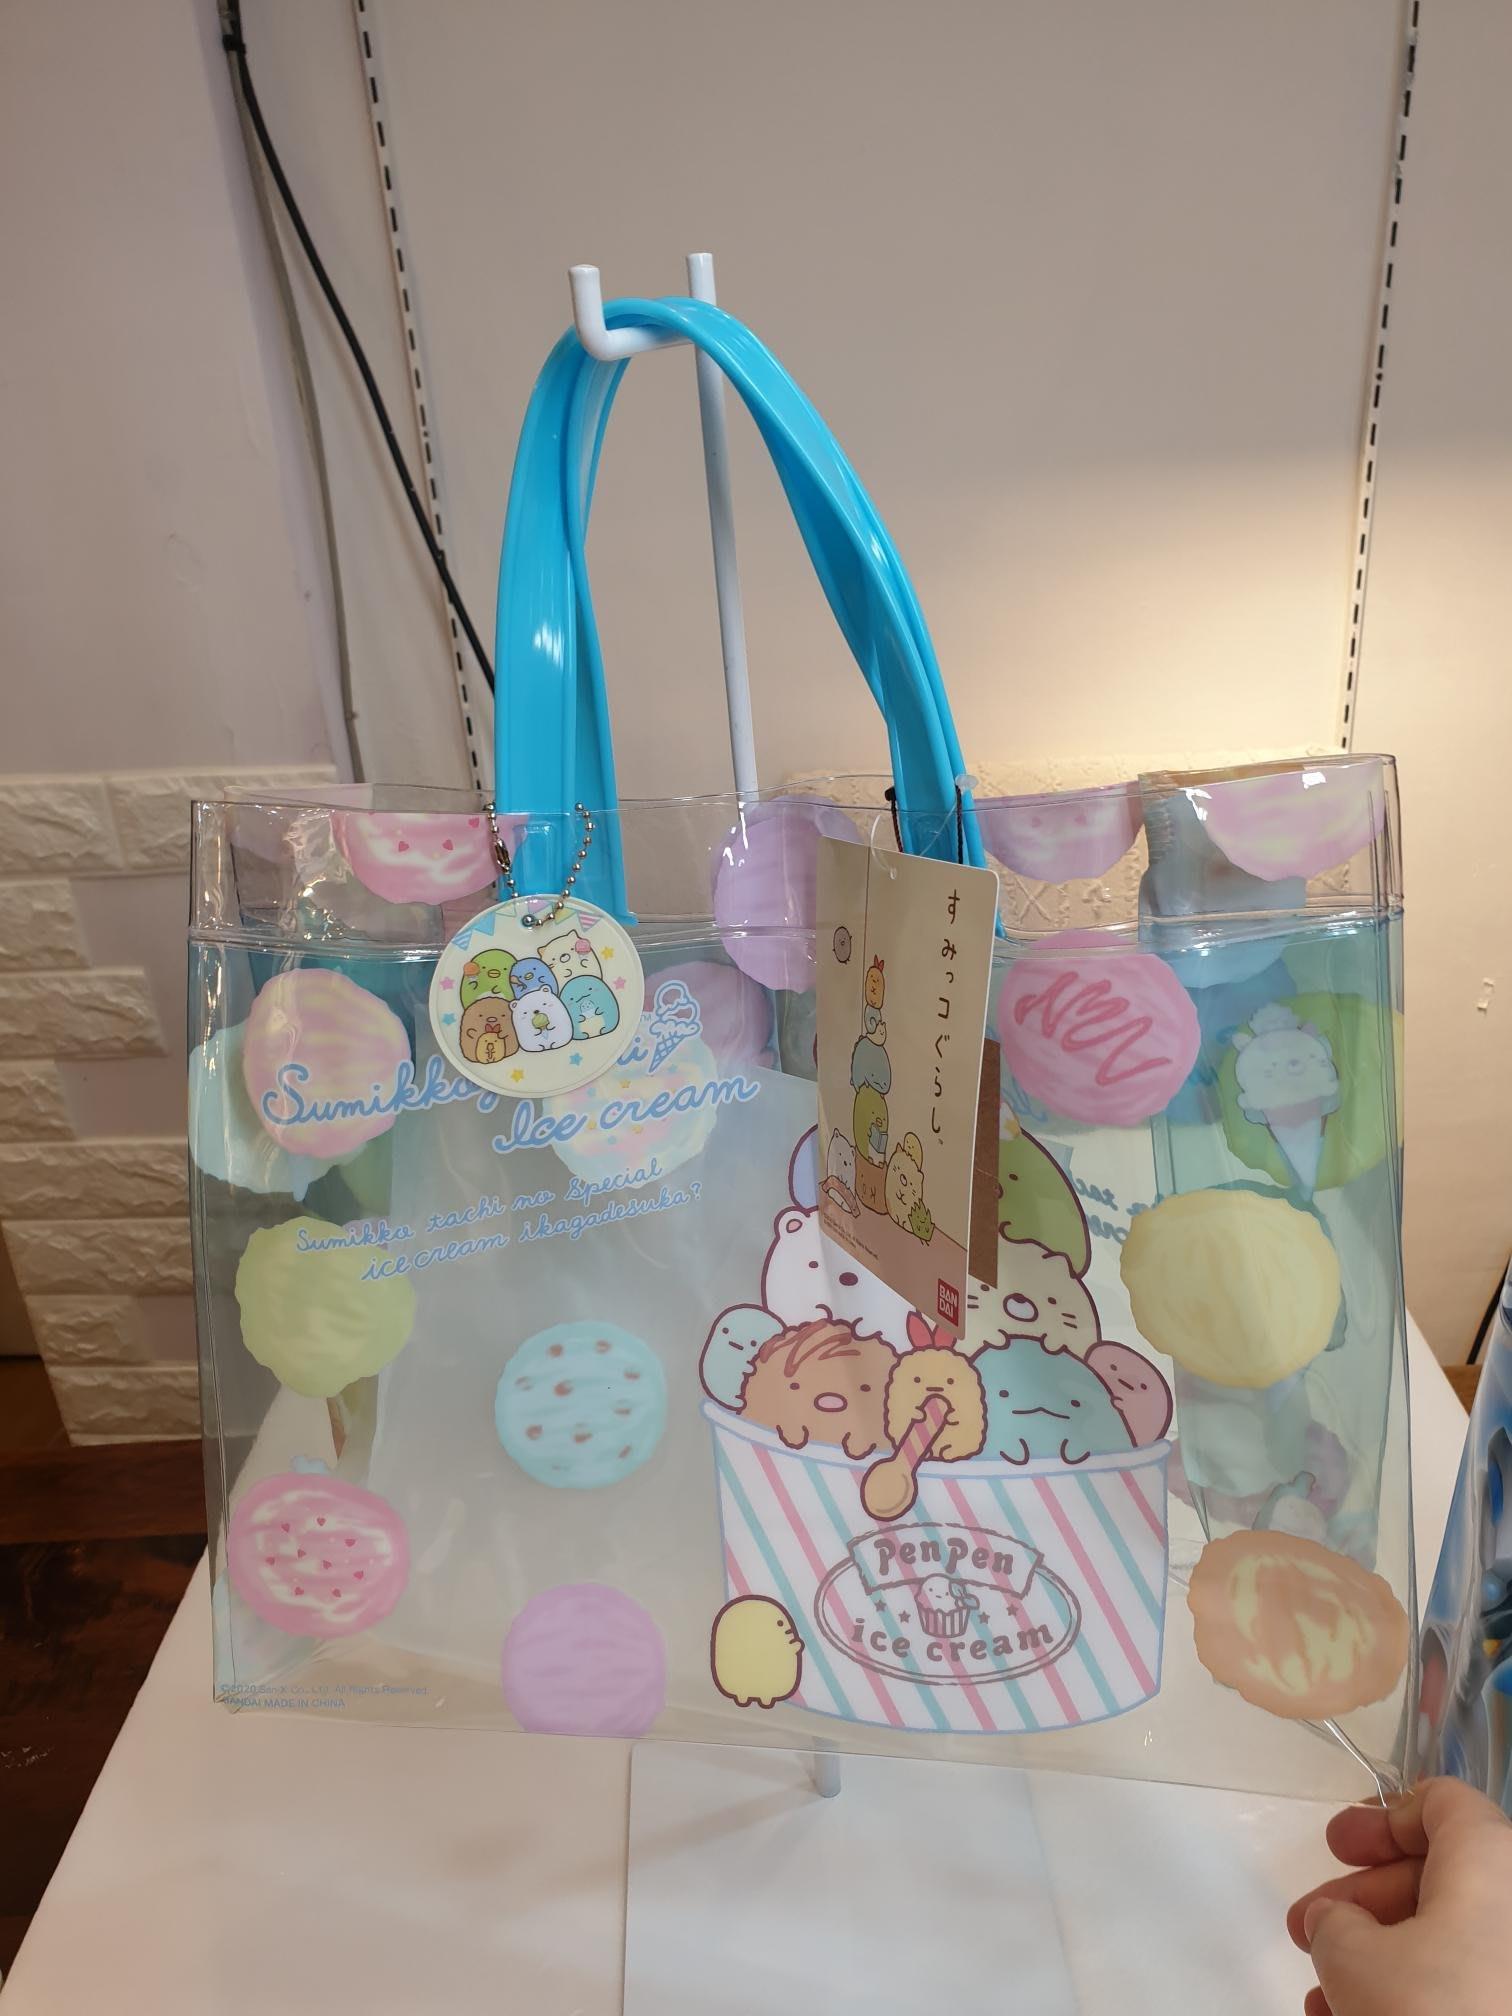 《Amys shop》日本直購~超可愛角落生物/Hellokitty /湯瑪士小火車/史奴比/假面超人/美樂蒂PVC海灘袋~現貨